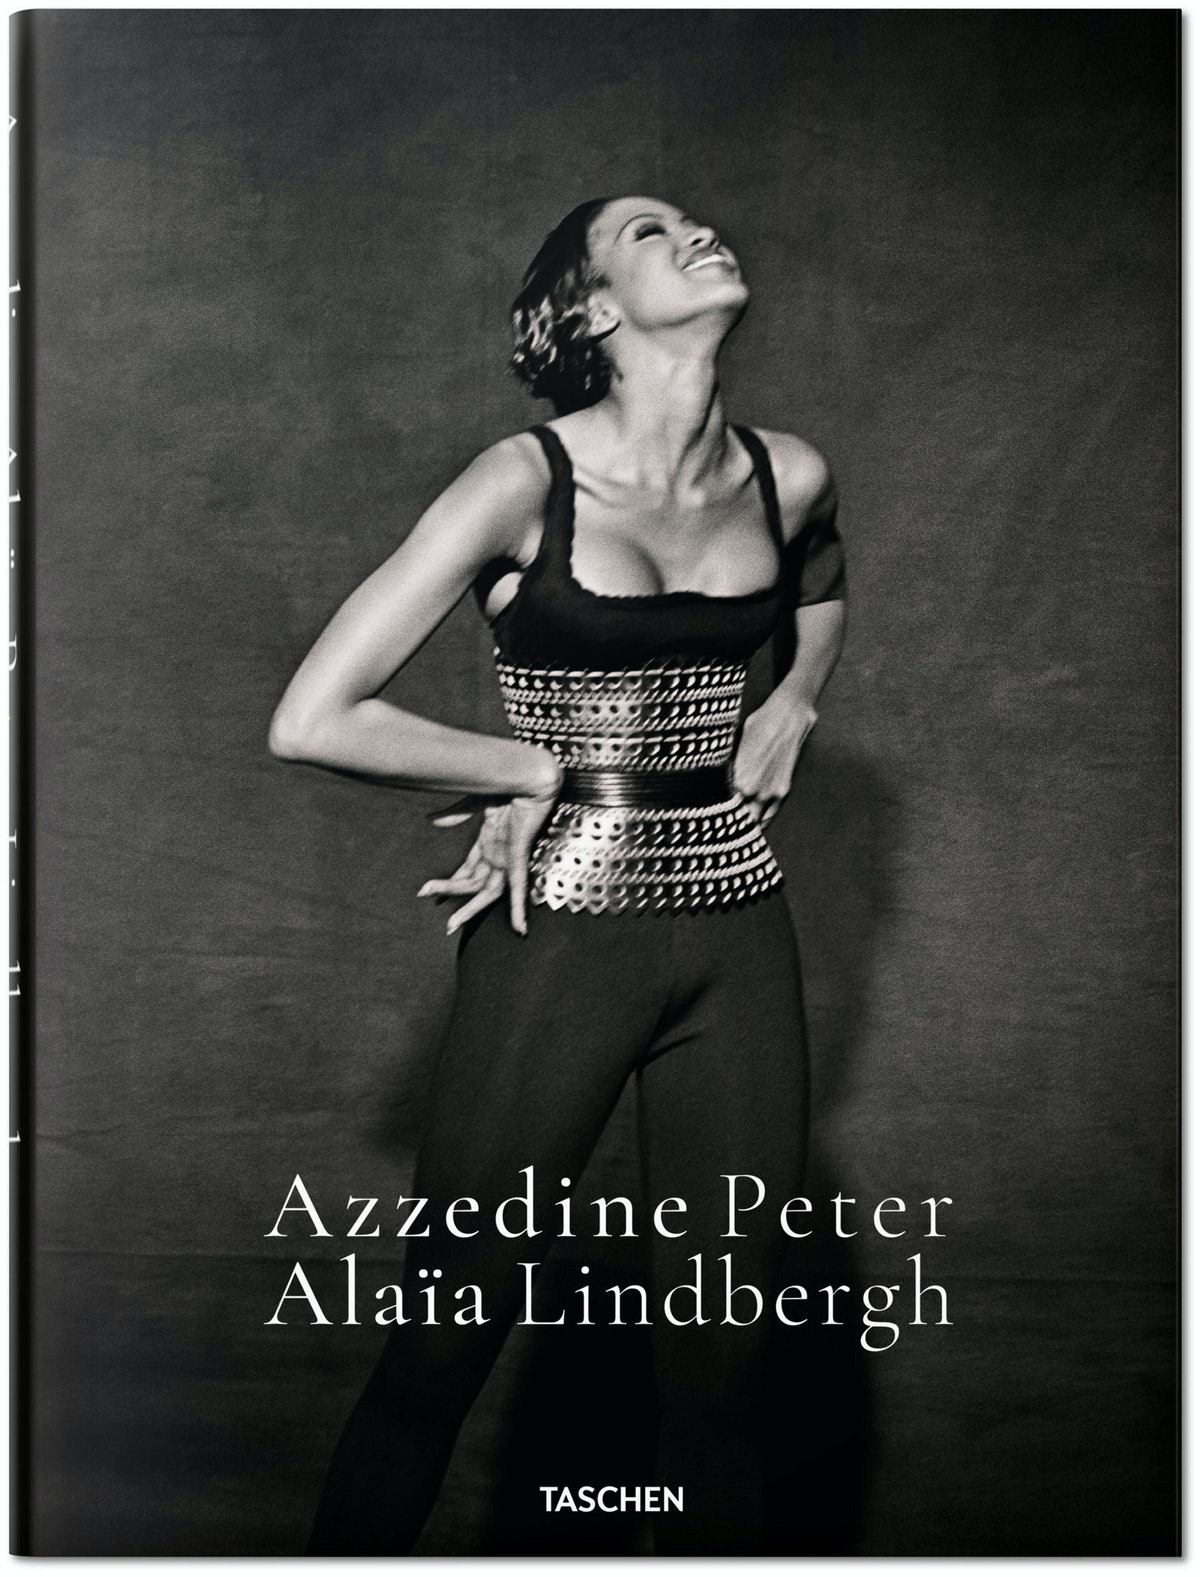 The cover of Peter Lindbergh. Azzedine Alaïa